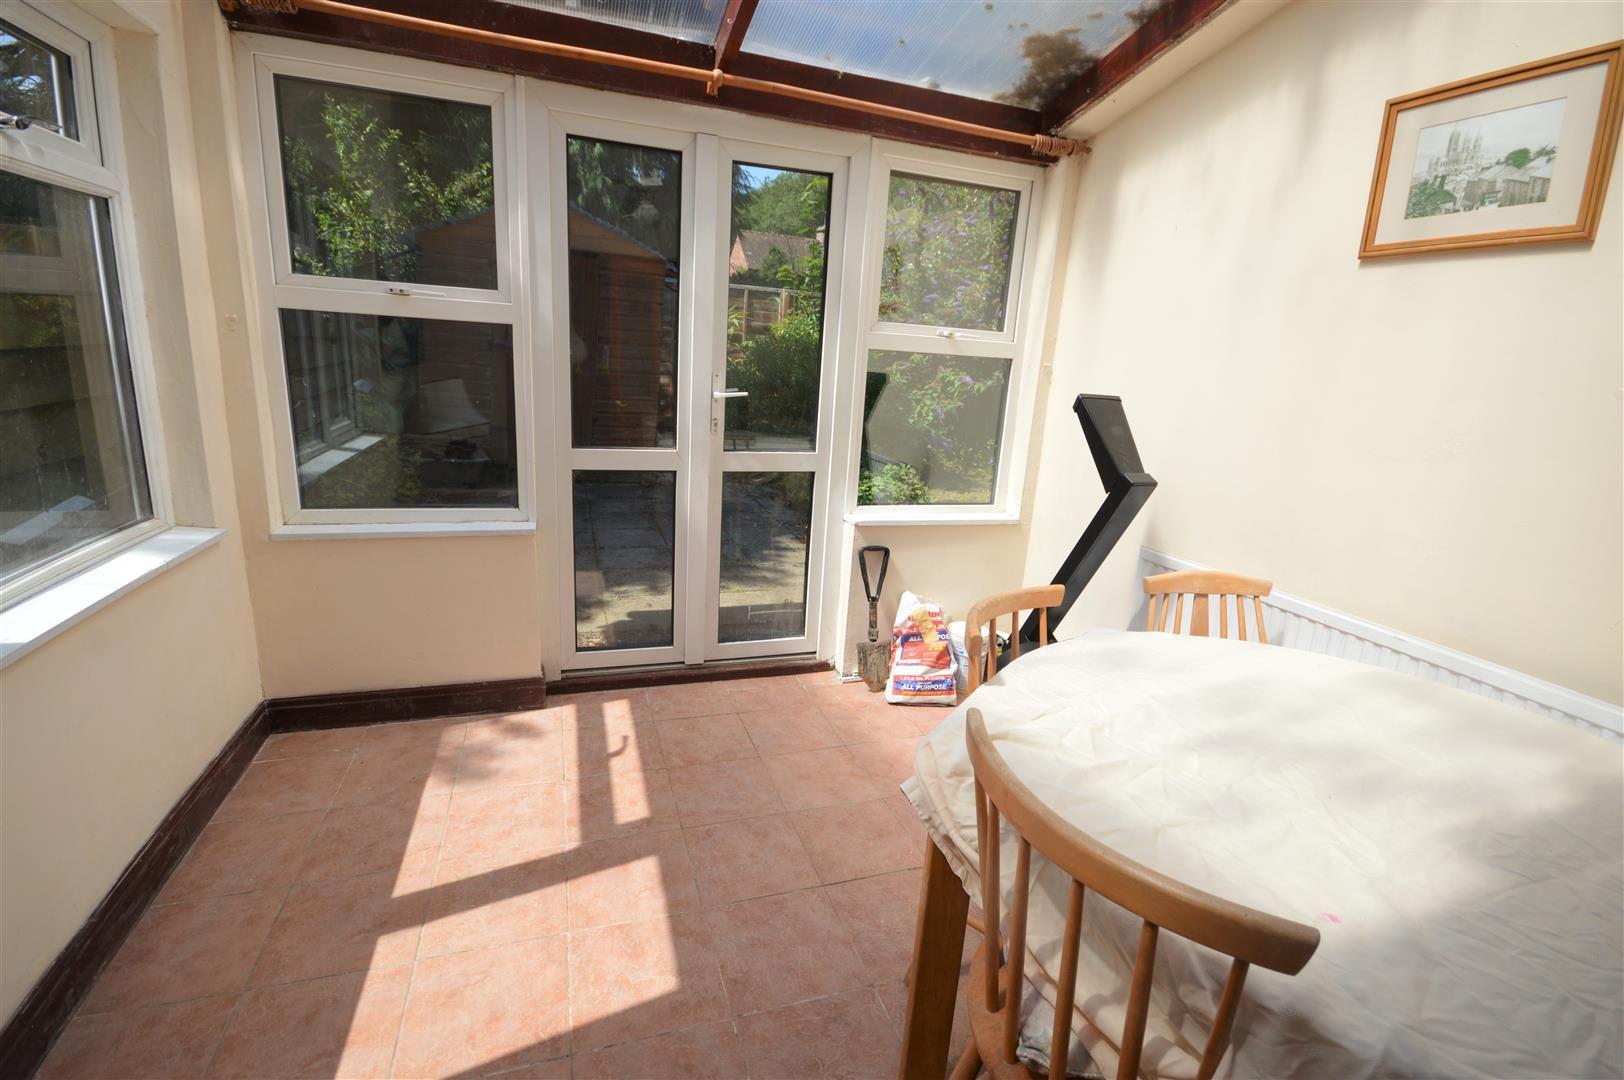 4 bed semi-detached for sale in Presteigne  - Property Image 5